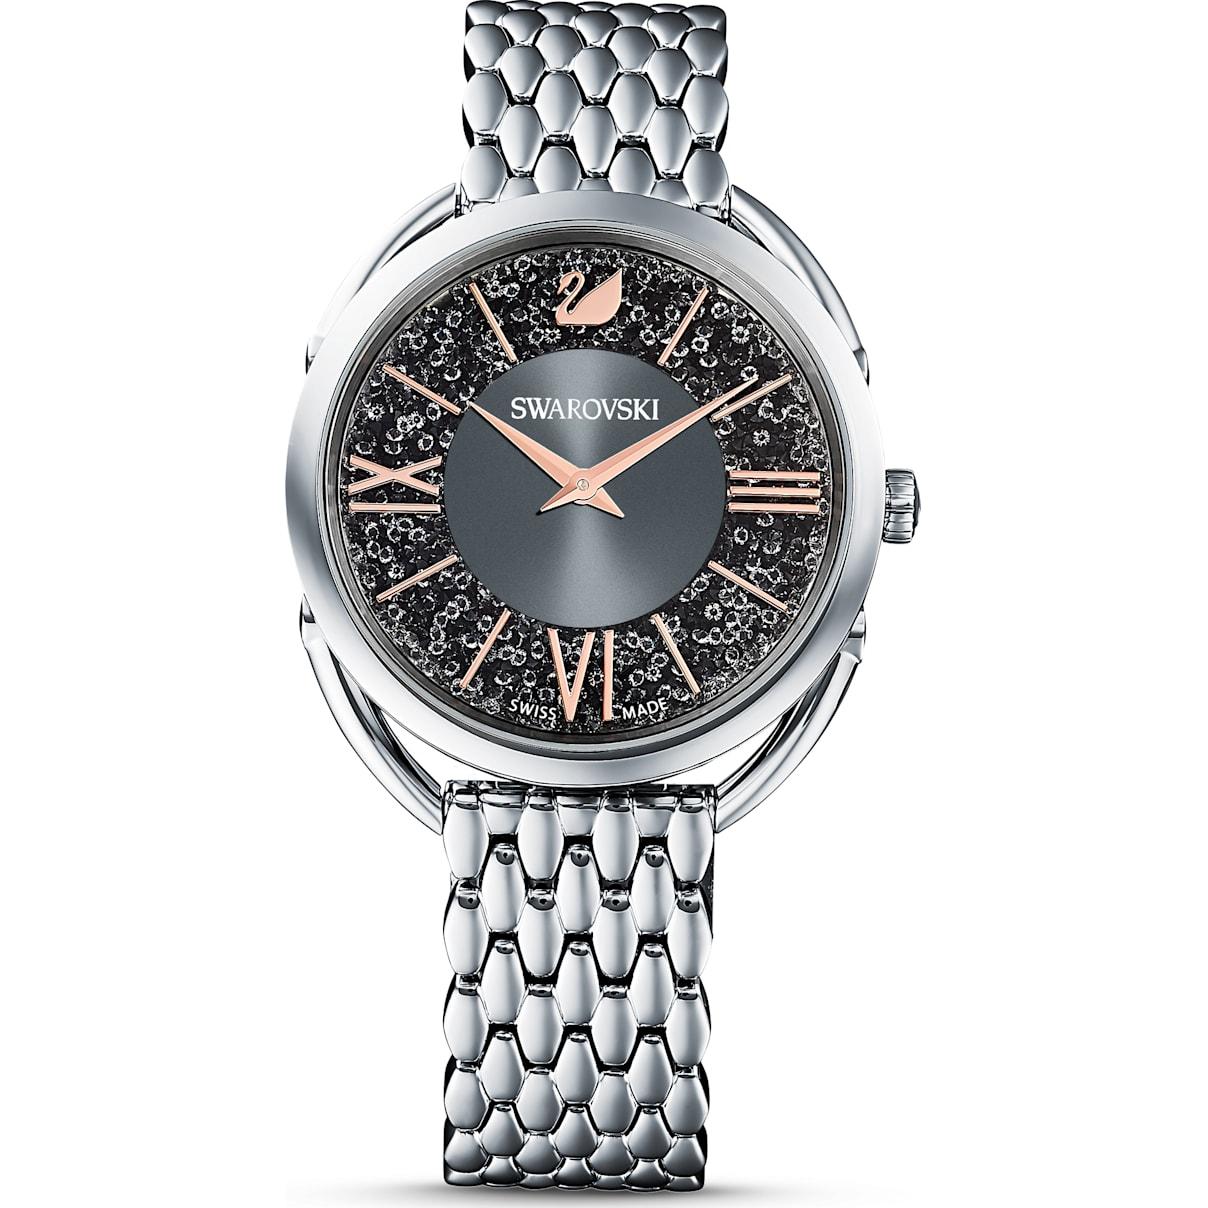 Swarovski Crystalline Glam Watch, Metal bracelet, Gray, Stainless steel